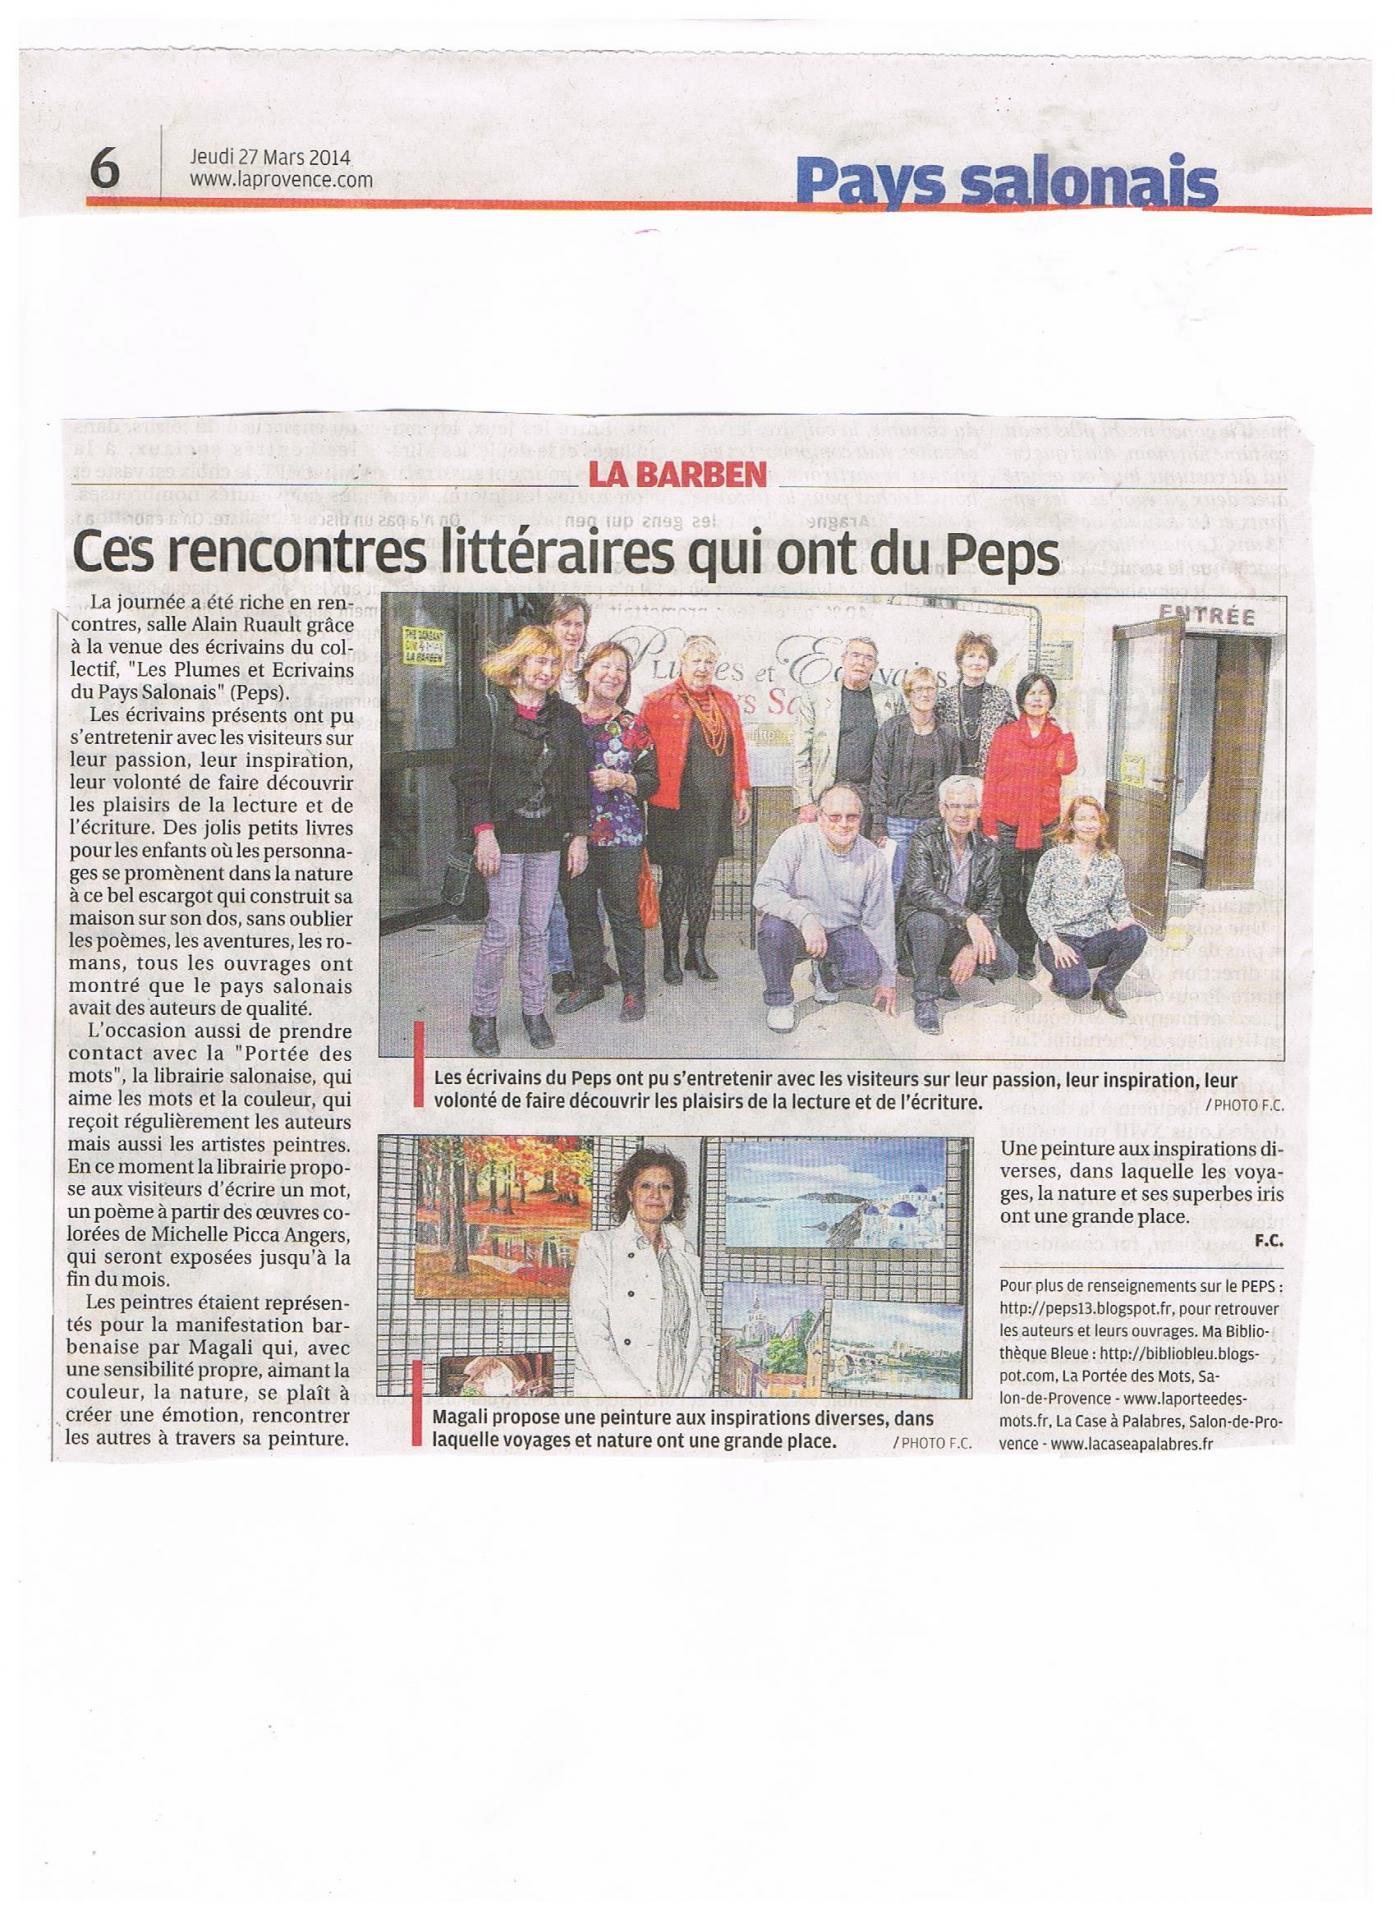 Article presse 03 2014